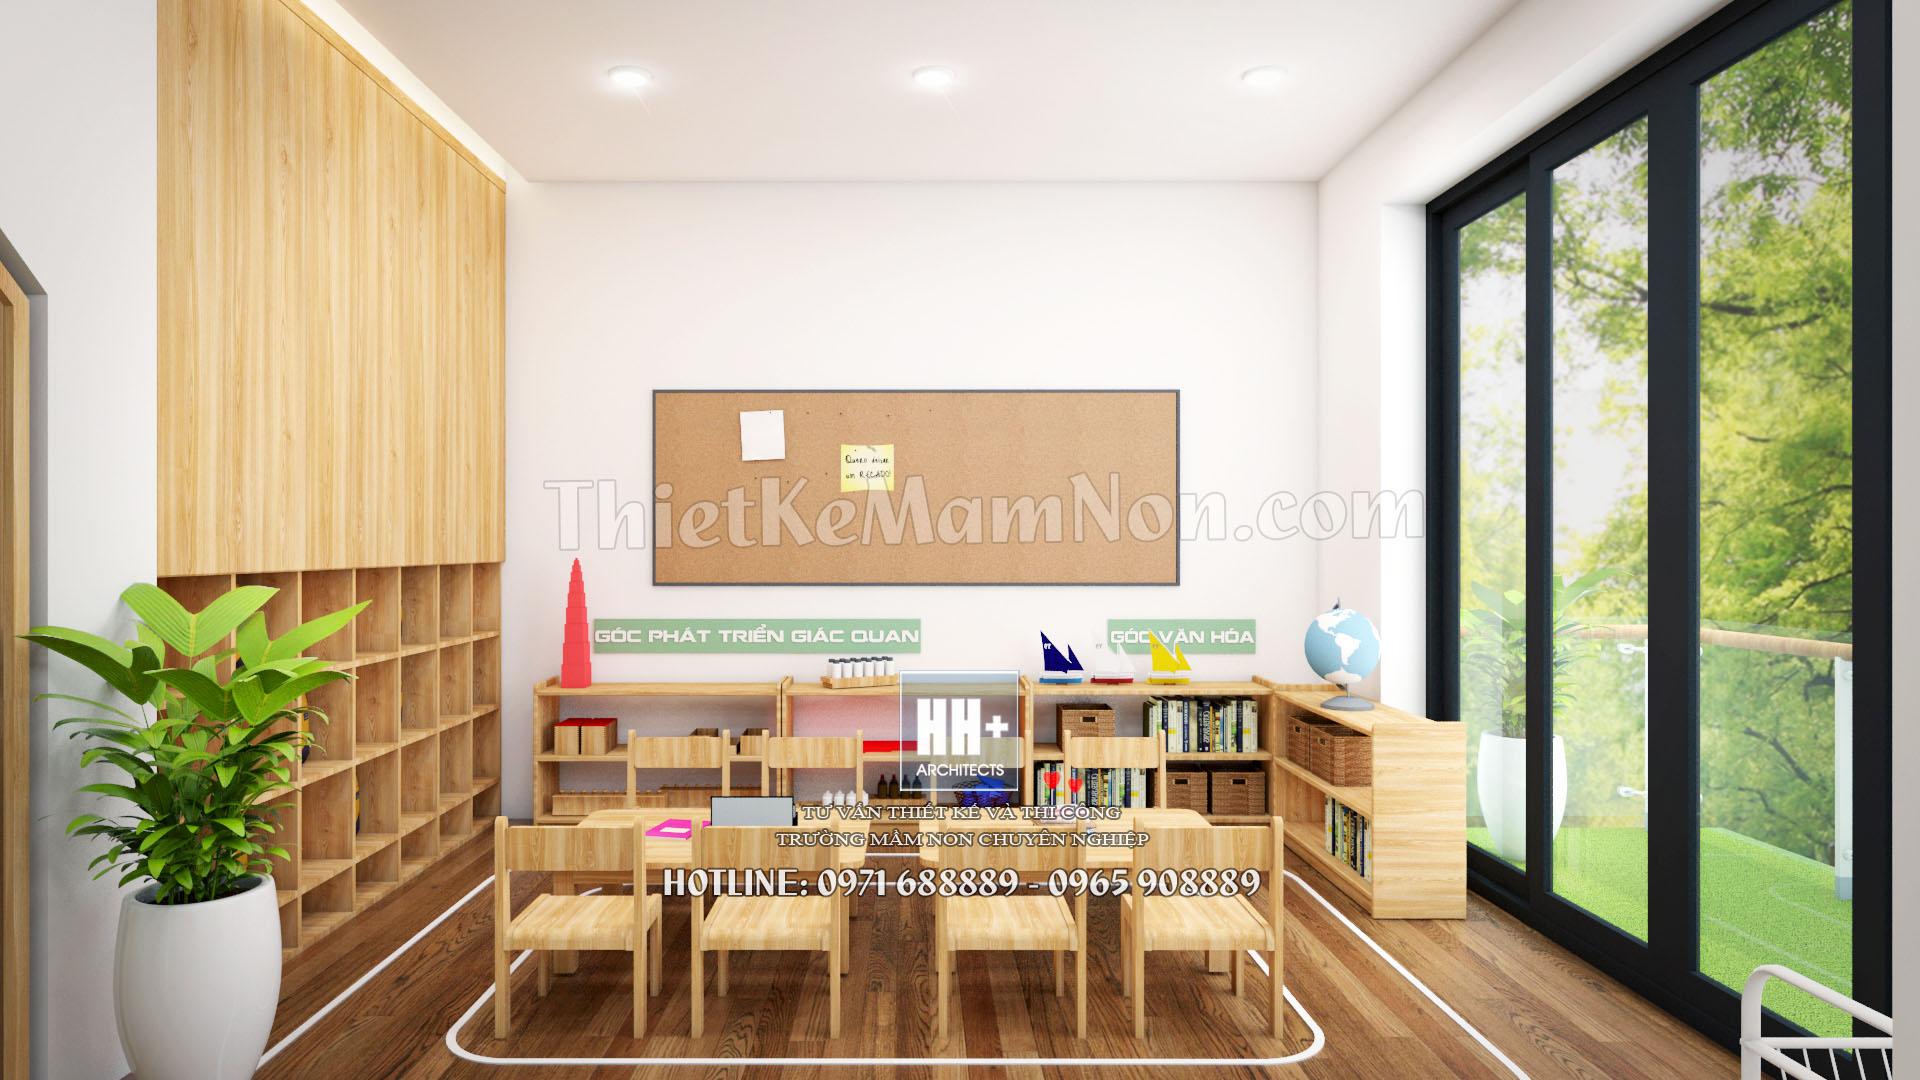 11 thiết kế trường mầm non montessori Thiết kế trường mầm non montessori Việt Anh 11 2